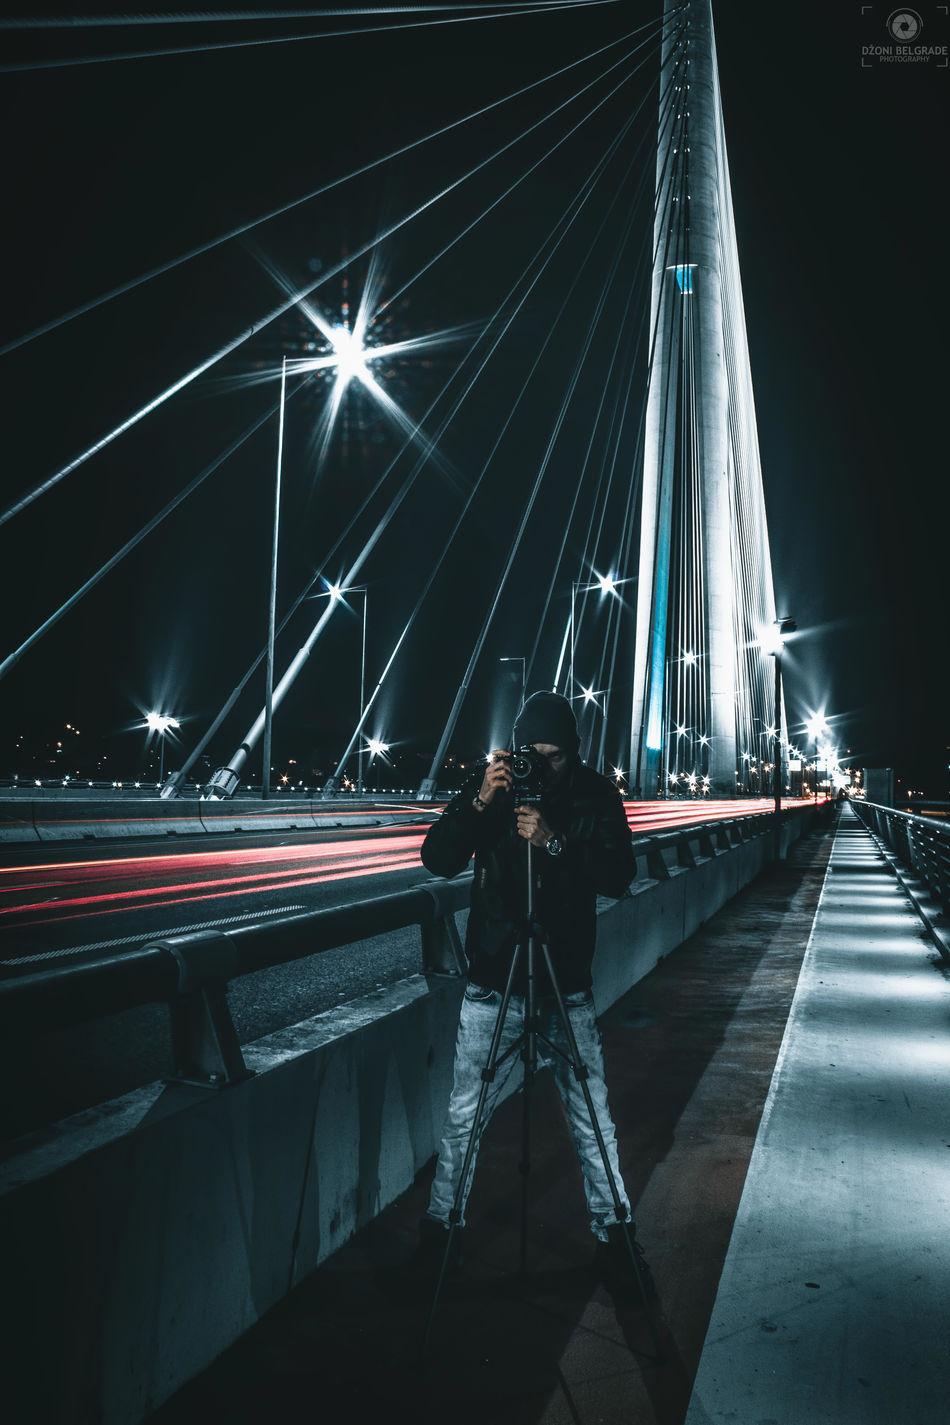 Architecture Longexposure Nikonphotography Don't Jump View Hello World EyeEm Best Shots Man People Shoot It Challenge Belgrade Mirrorselfie Love Moody Photooftheday Nightphotography Night Night Lights Serbia